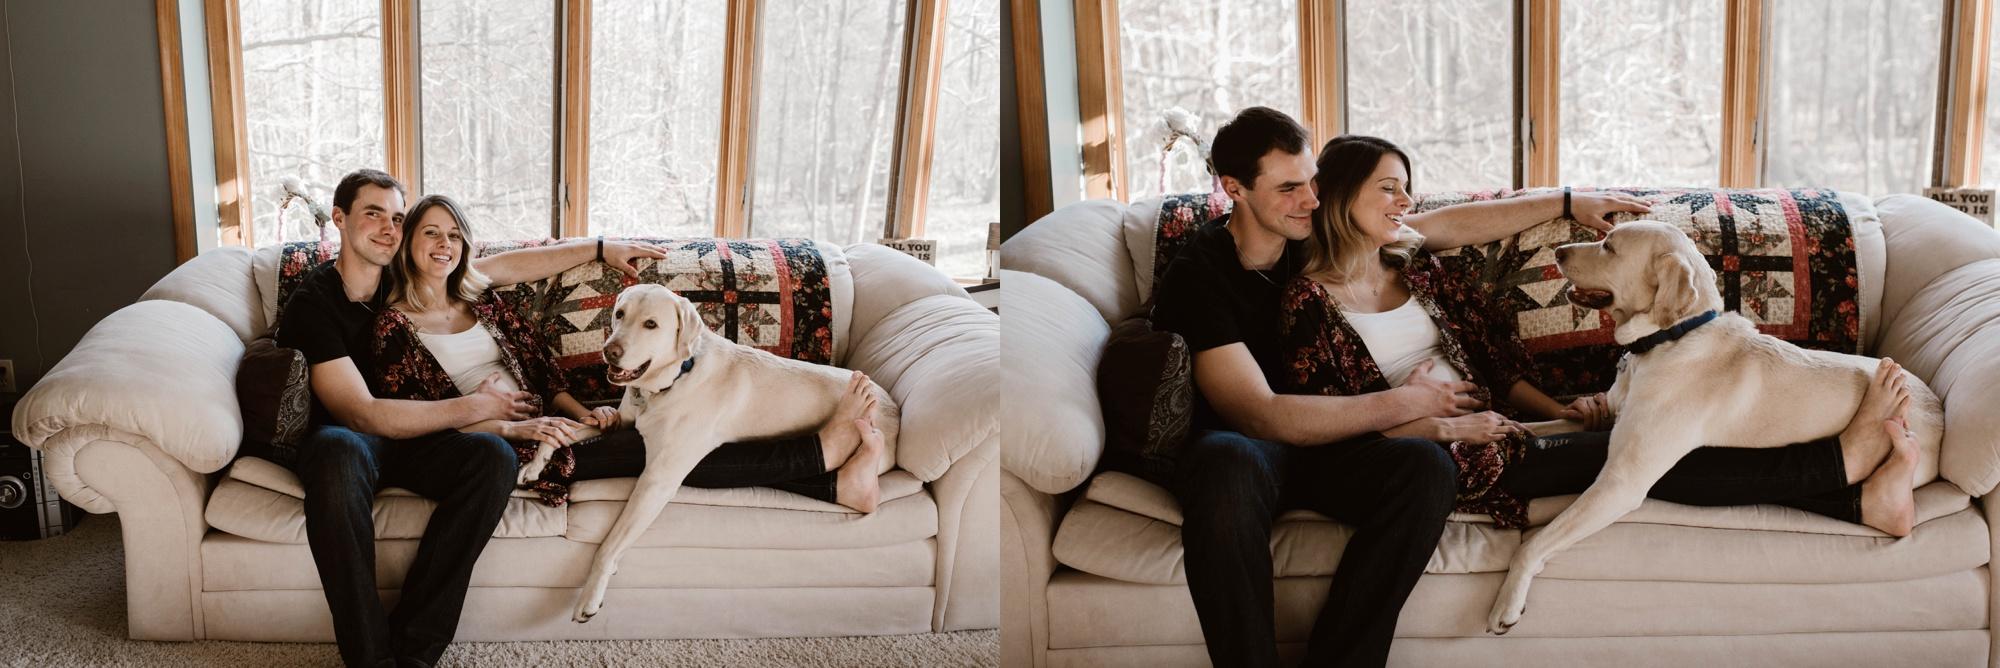 maternity-danielle-b-lauren-grayson-cleveland-akron-canton-ohio-photographer-family-maternity-photography-session-photos-_0008.jpg